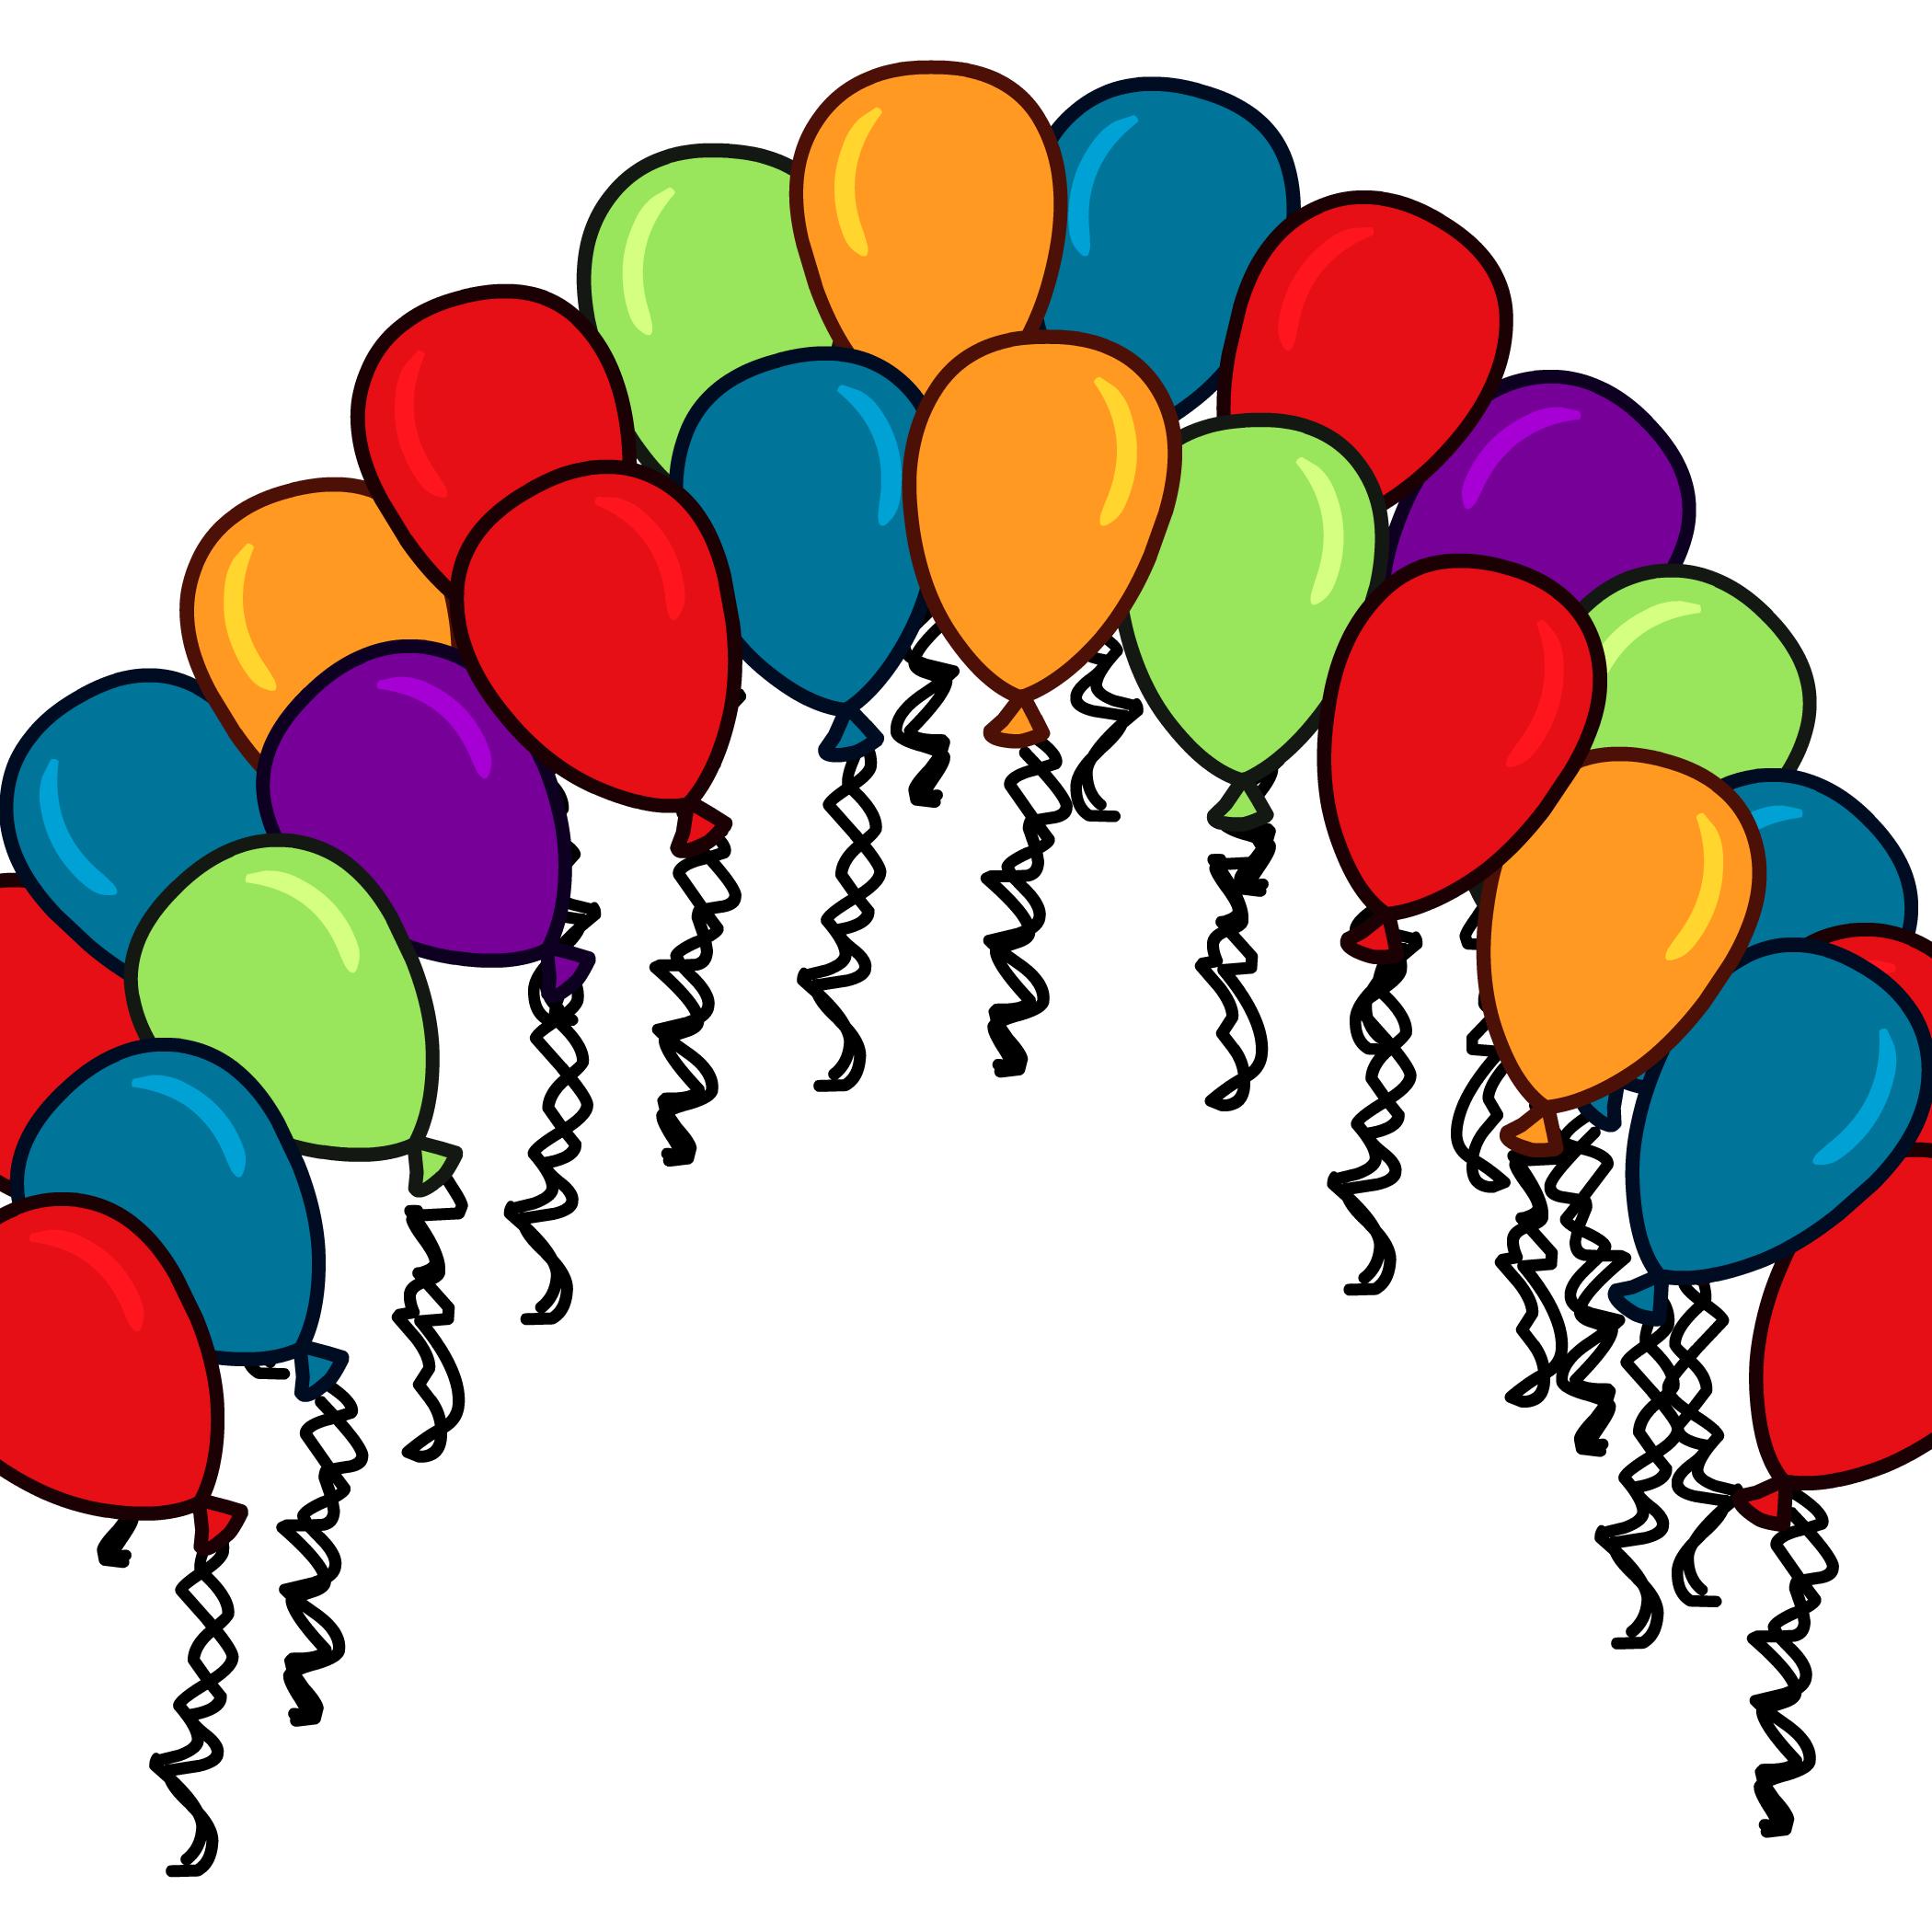 2100x2100 Balloon Arch Background Club Penguin Wiki Fandom Powered By Wikia